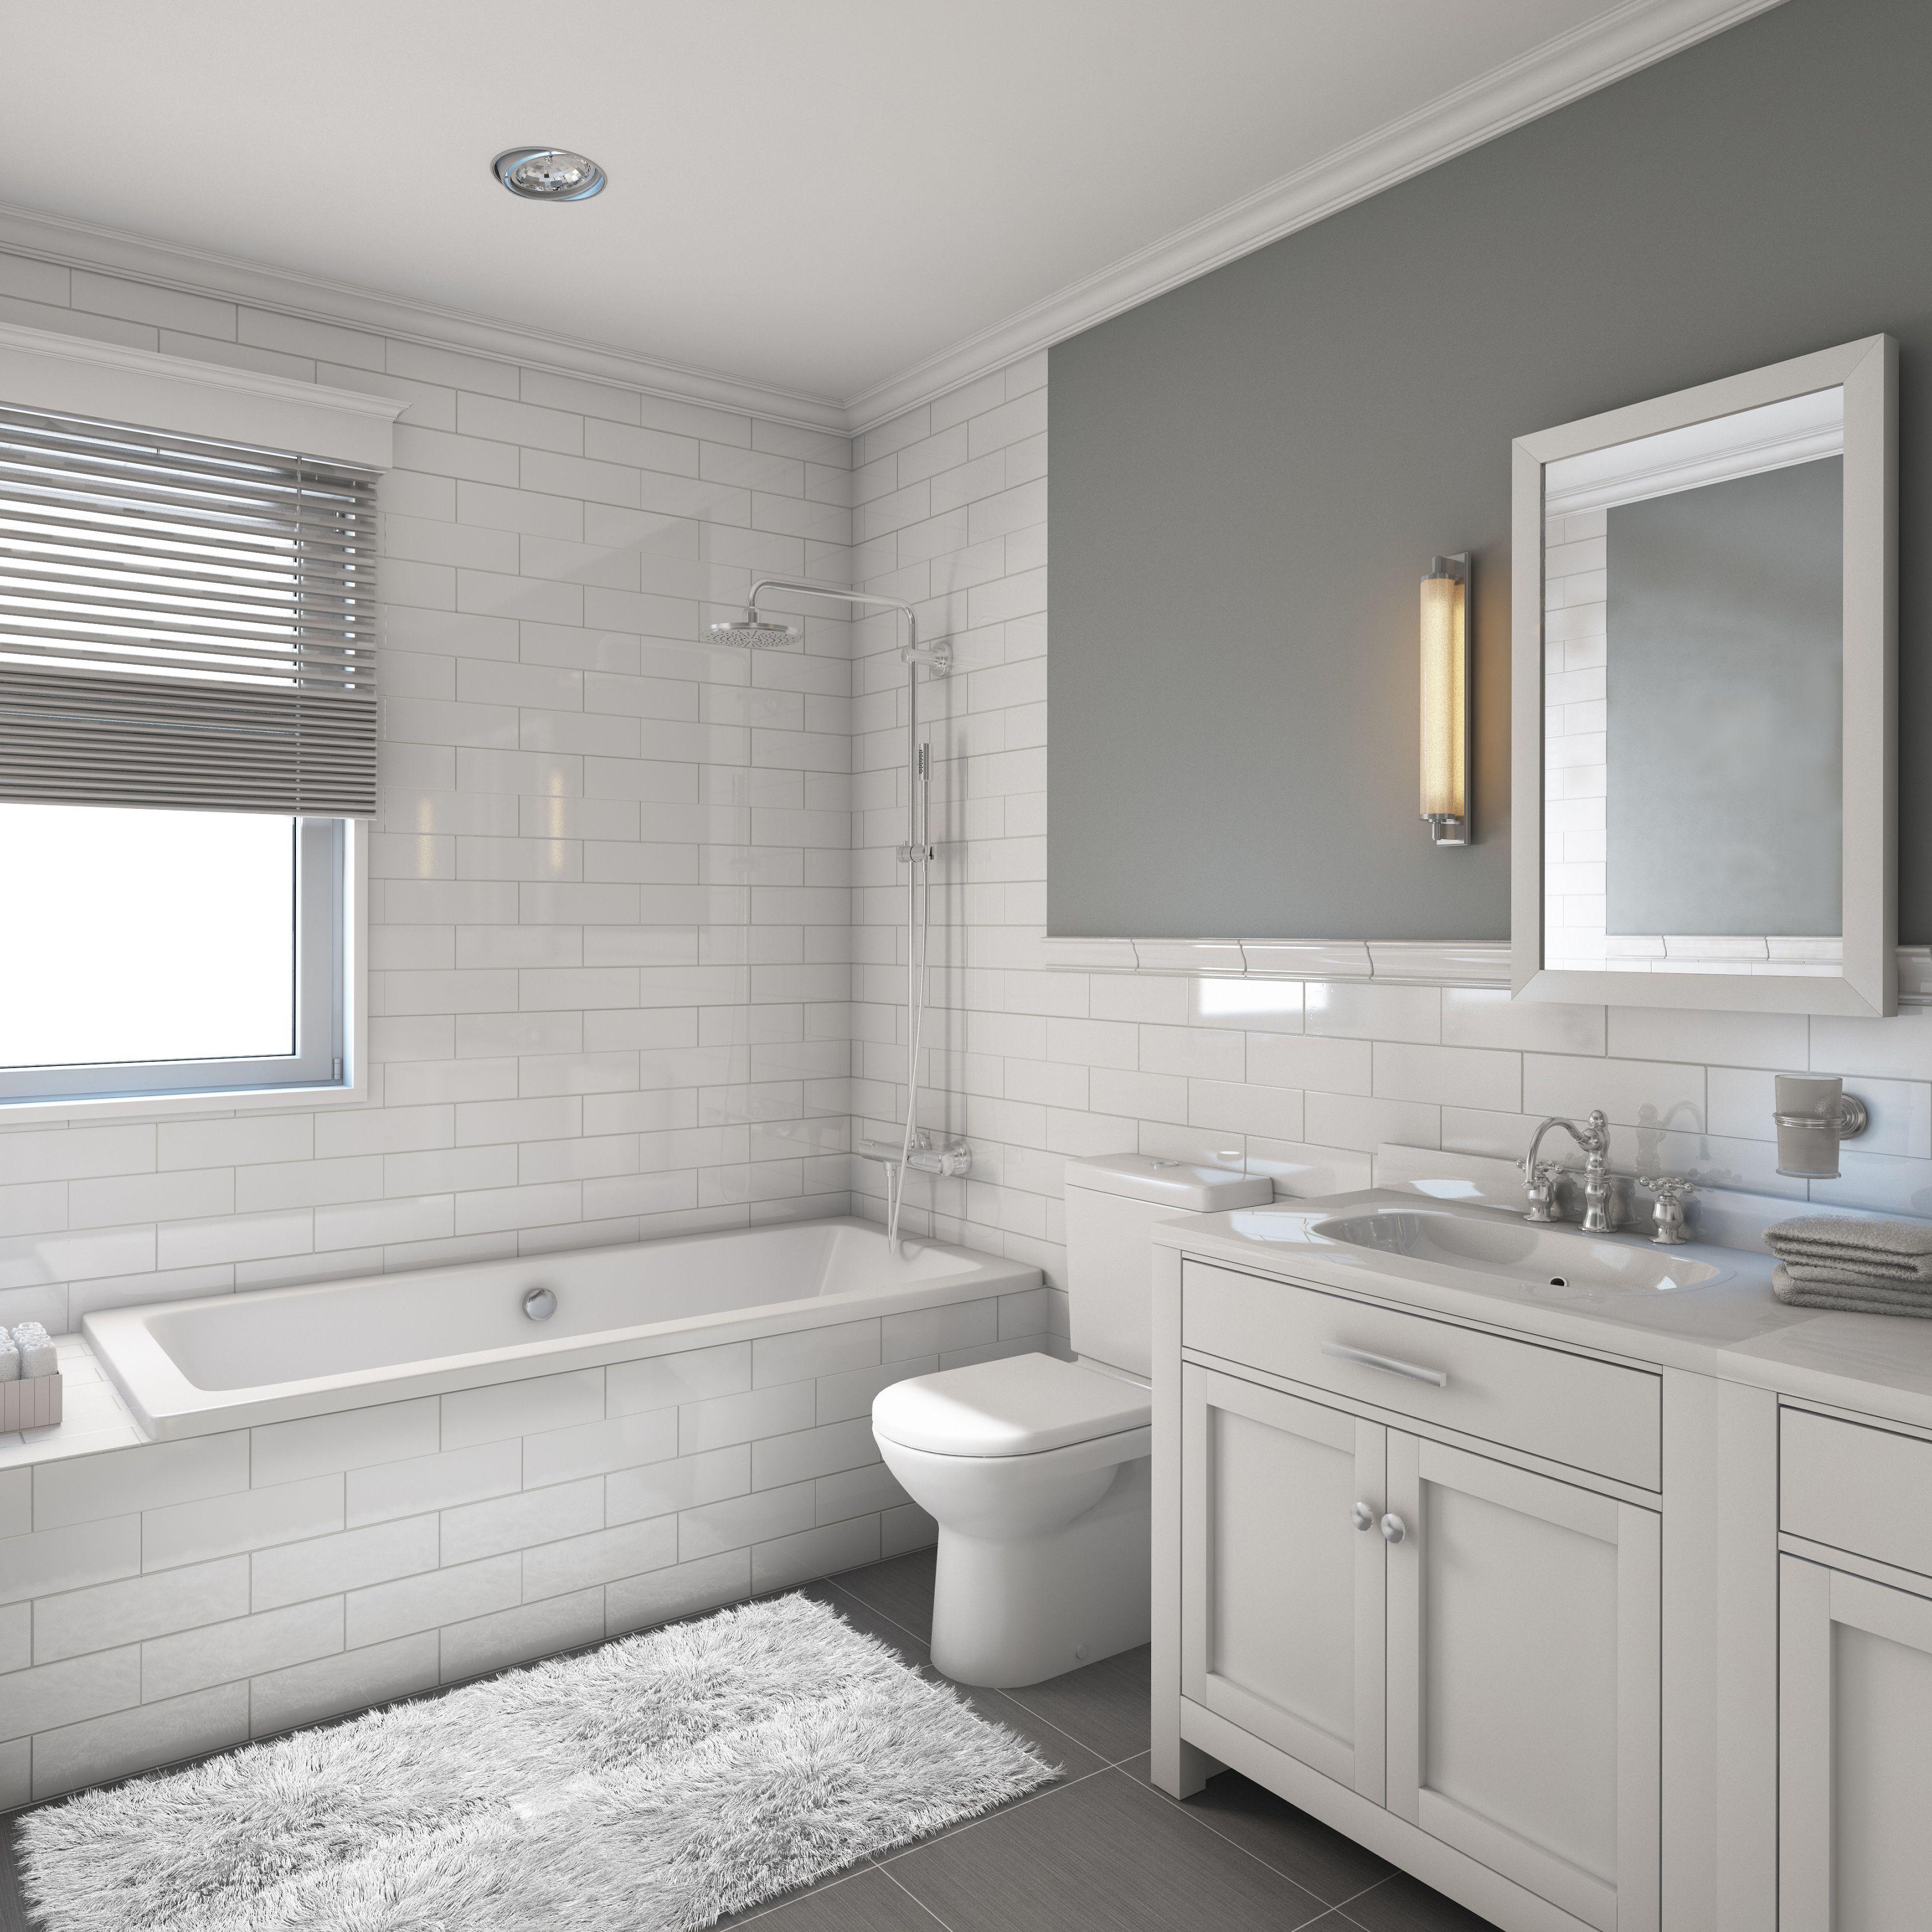 17 Clic Gray And White Bathrooms